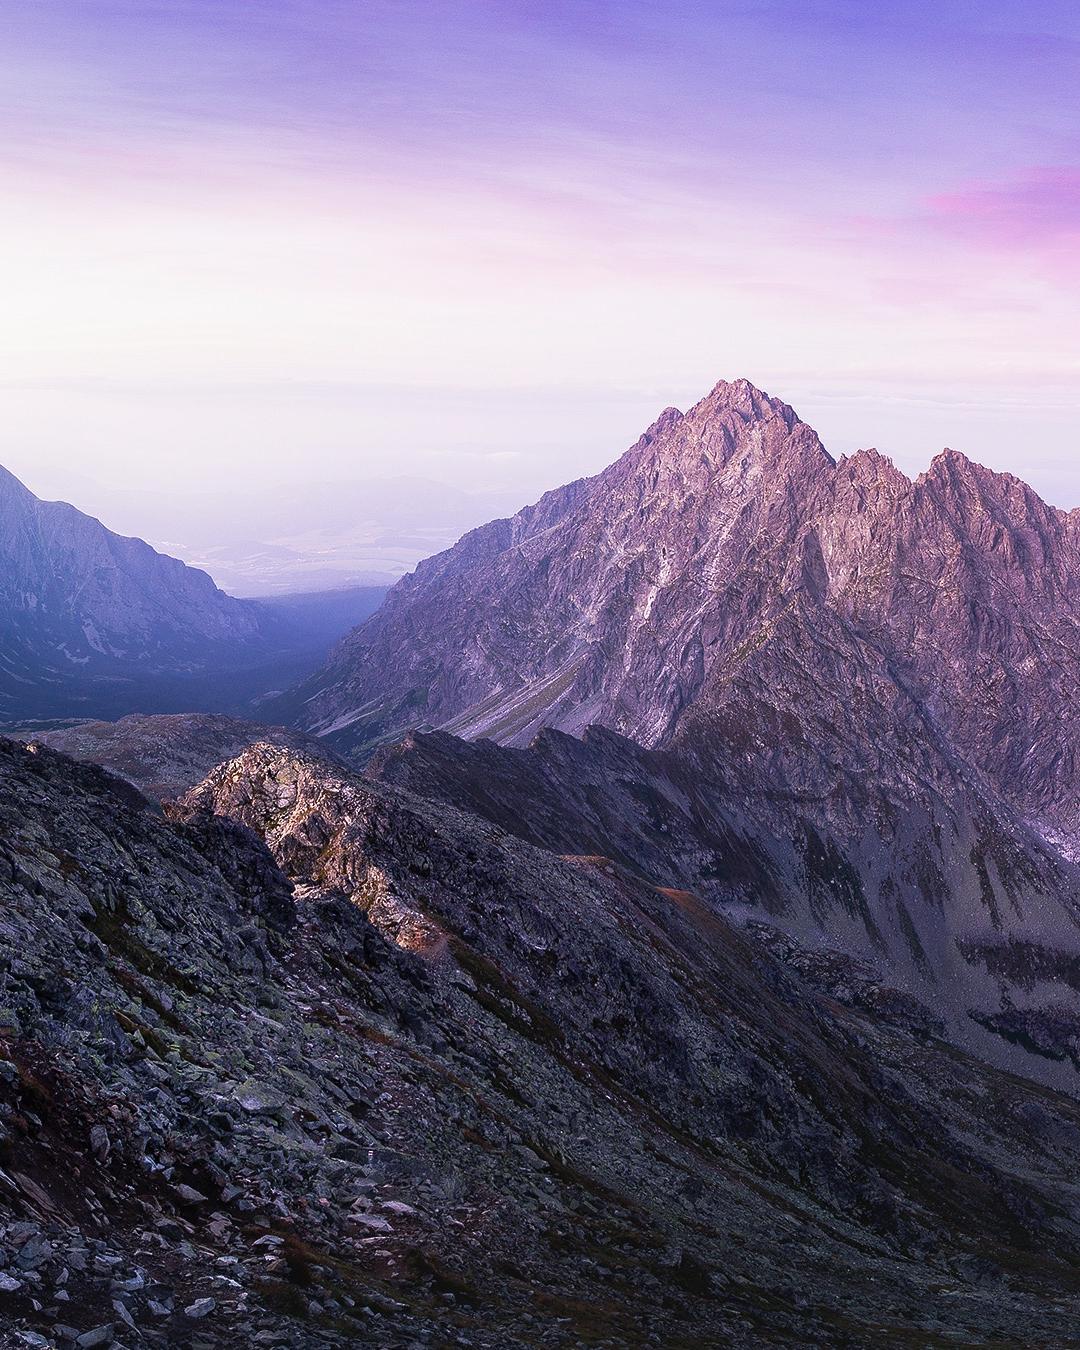 Mountain, Peak iPhone Wallpaper